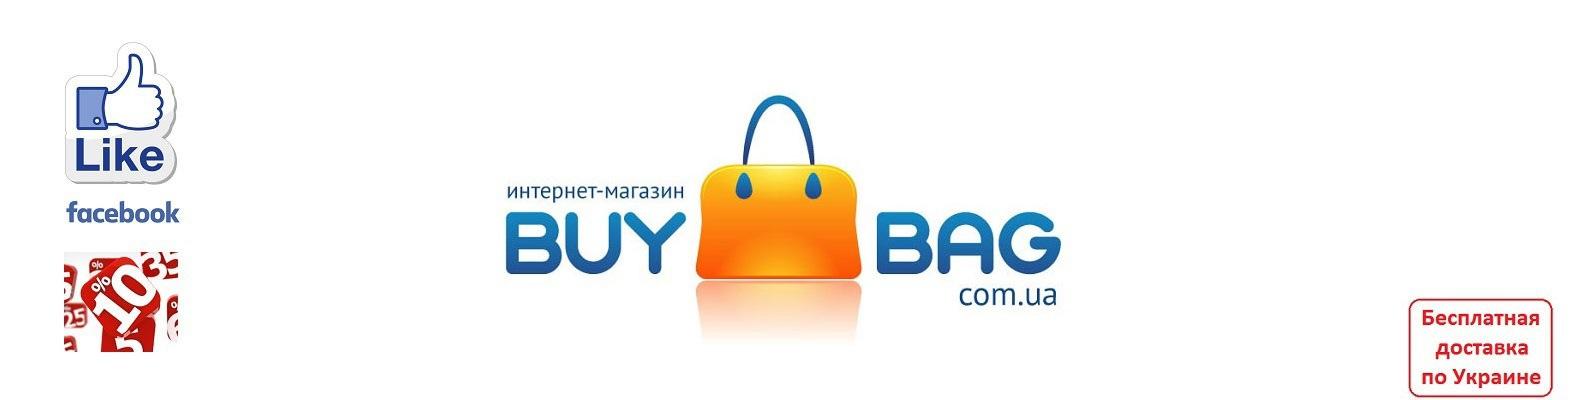 8662838c1b2a BuyBag.com.ua | ВКонтакте